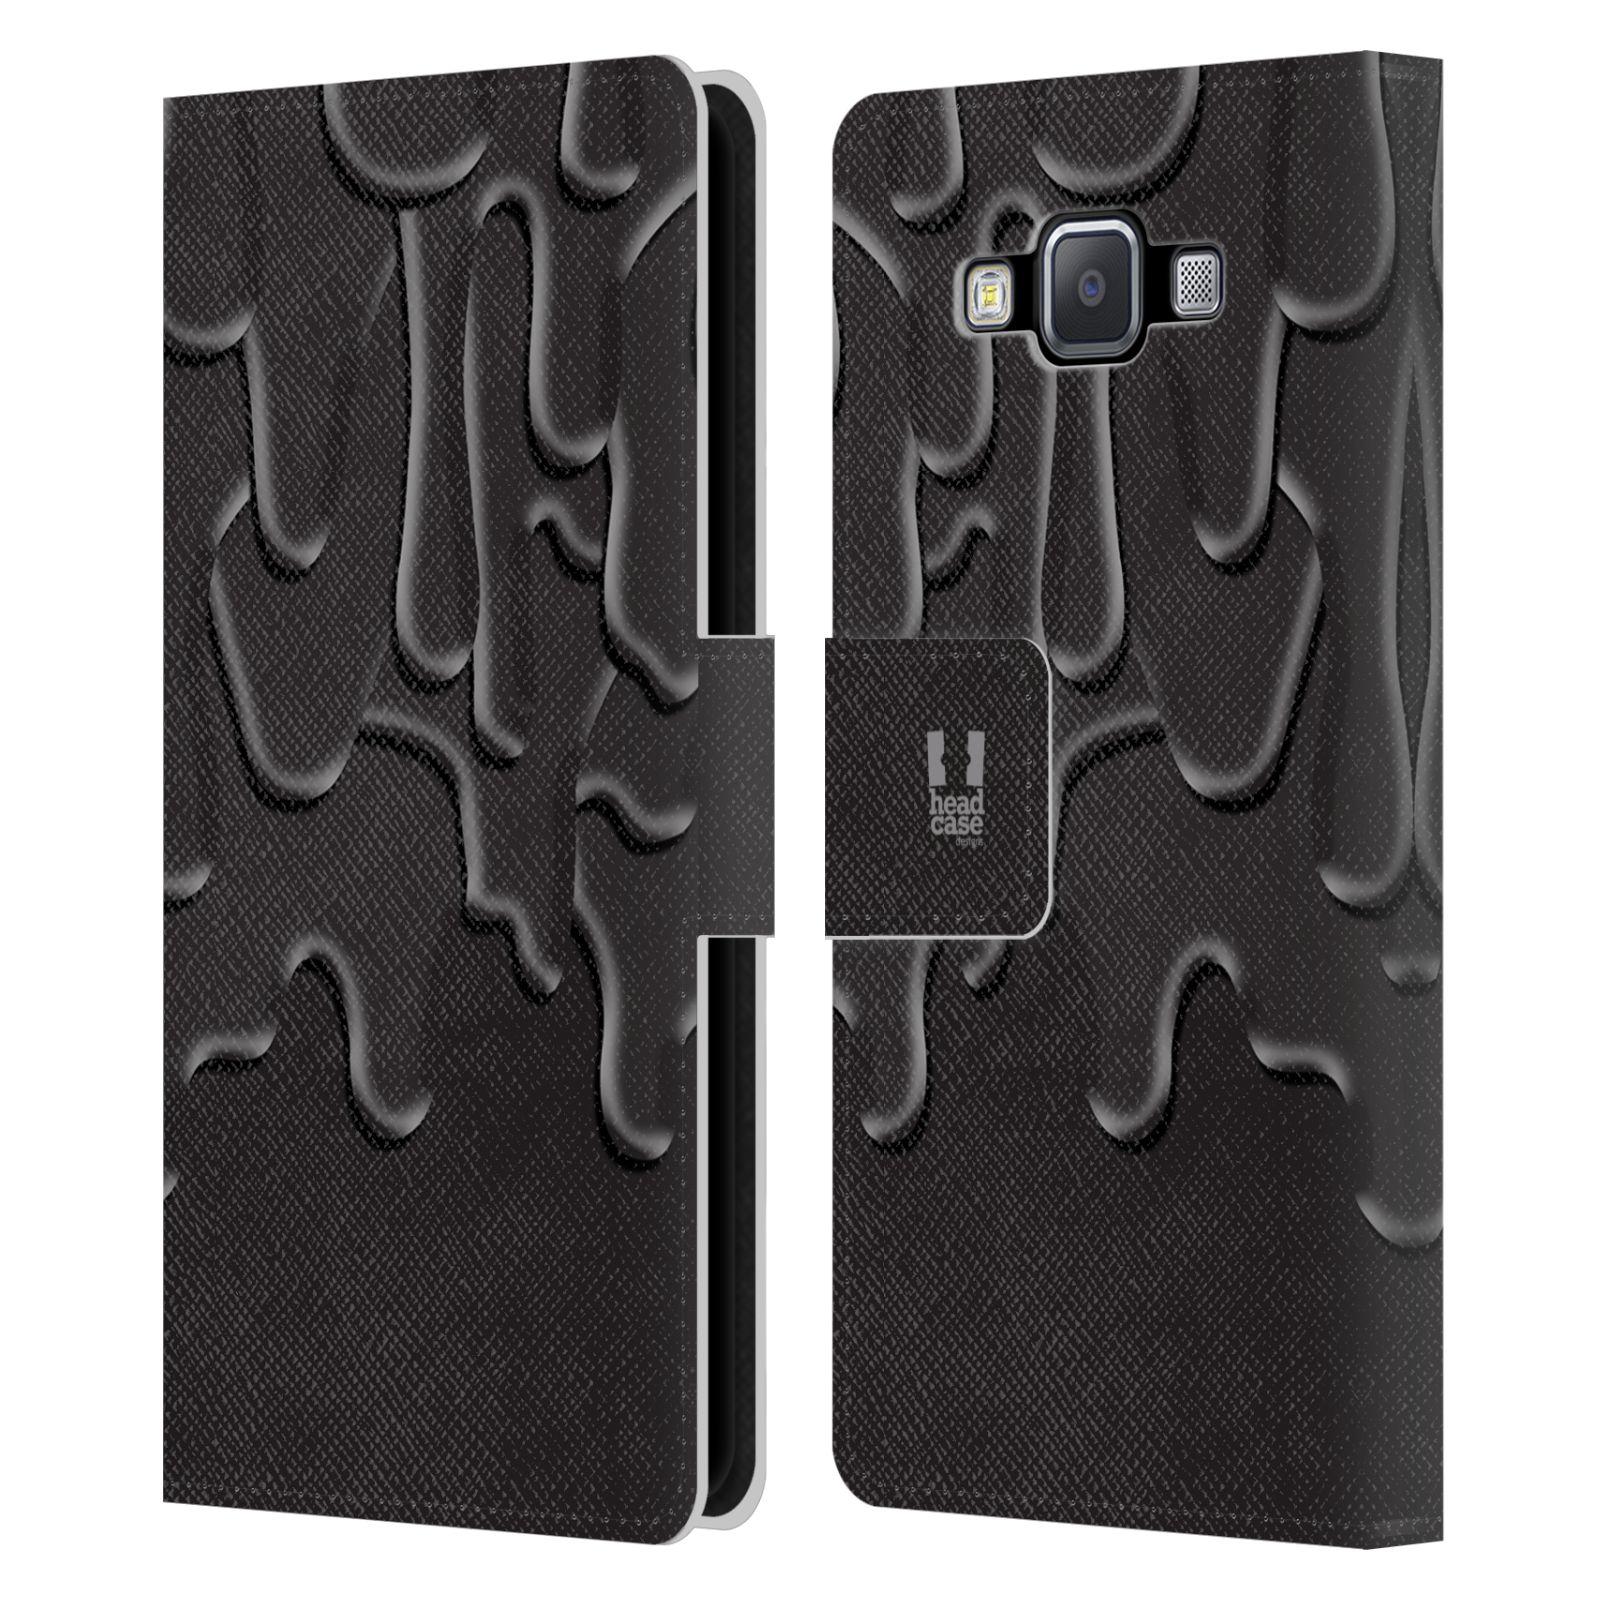 HEAD CASE Flipové pouzdro pro mobil Samsung Galaxy A5 ZÁPLAVA BARVA černá